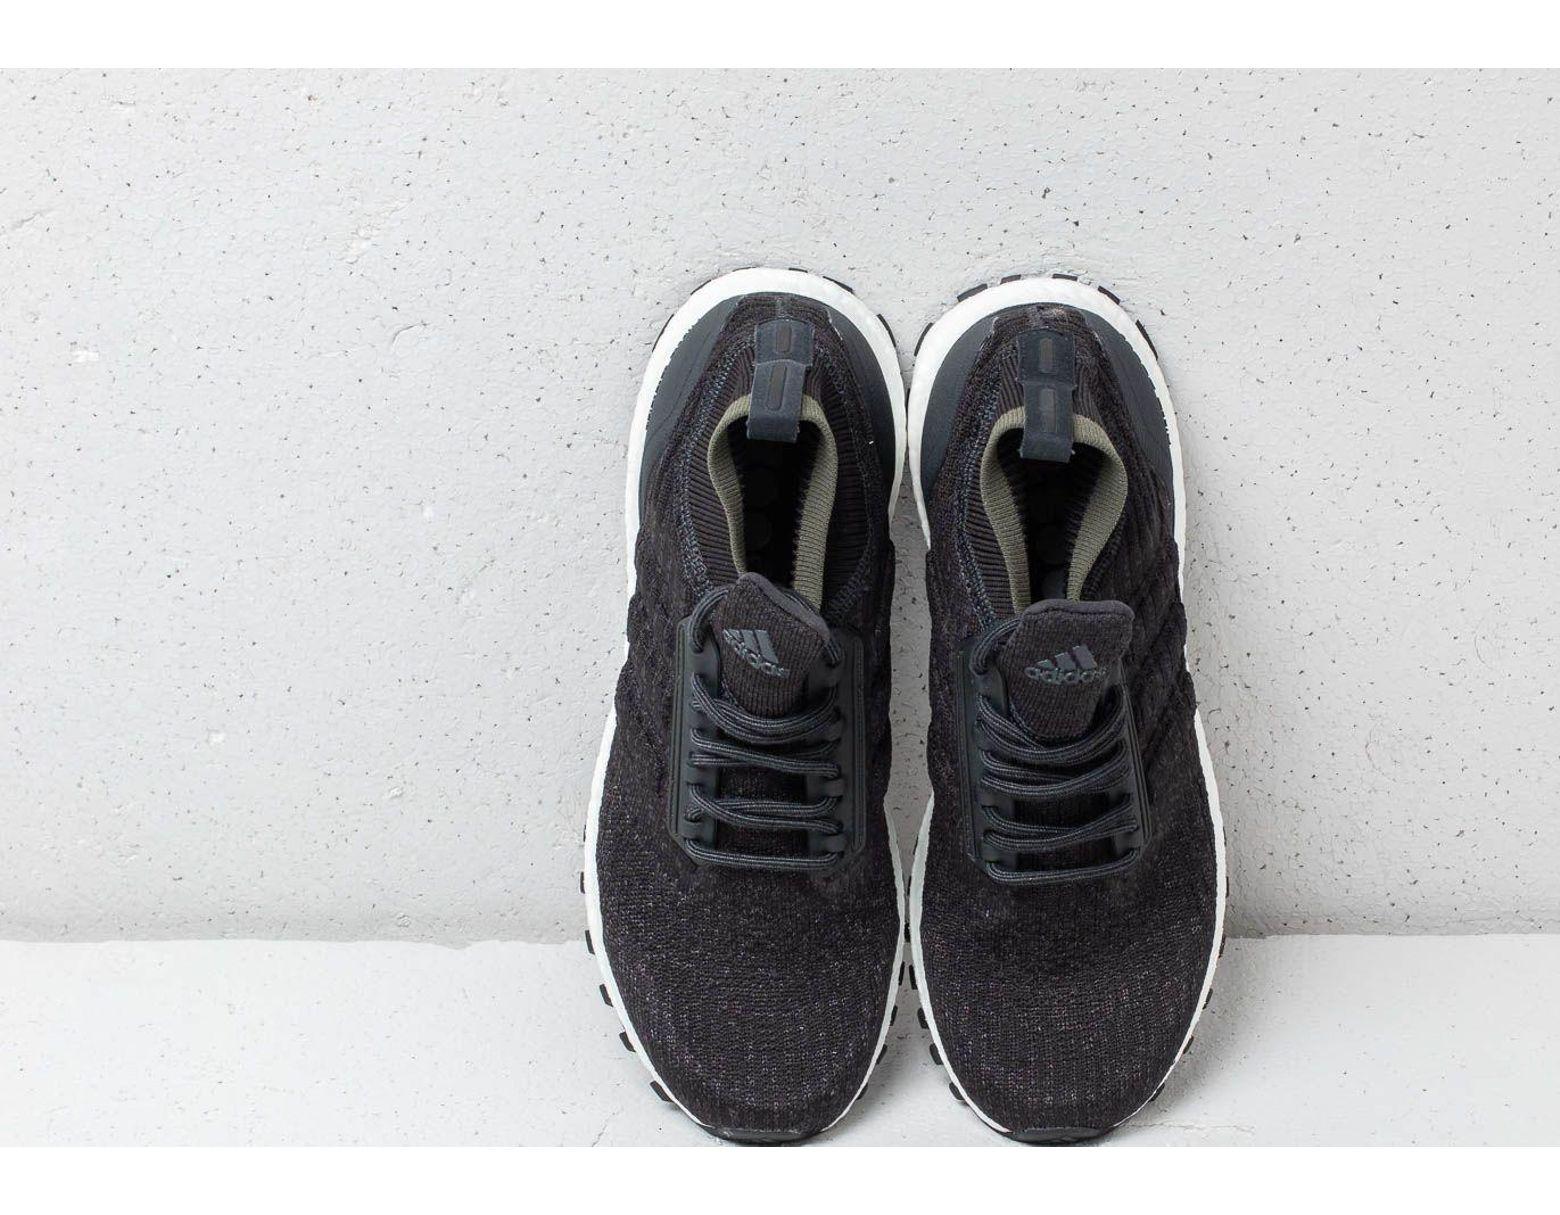 eca03c18d08ac Lyst - adidas Originals Adidas Ultraboost All Terrain Carbon  Core Black  Cloud  White in Black for Men